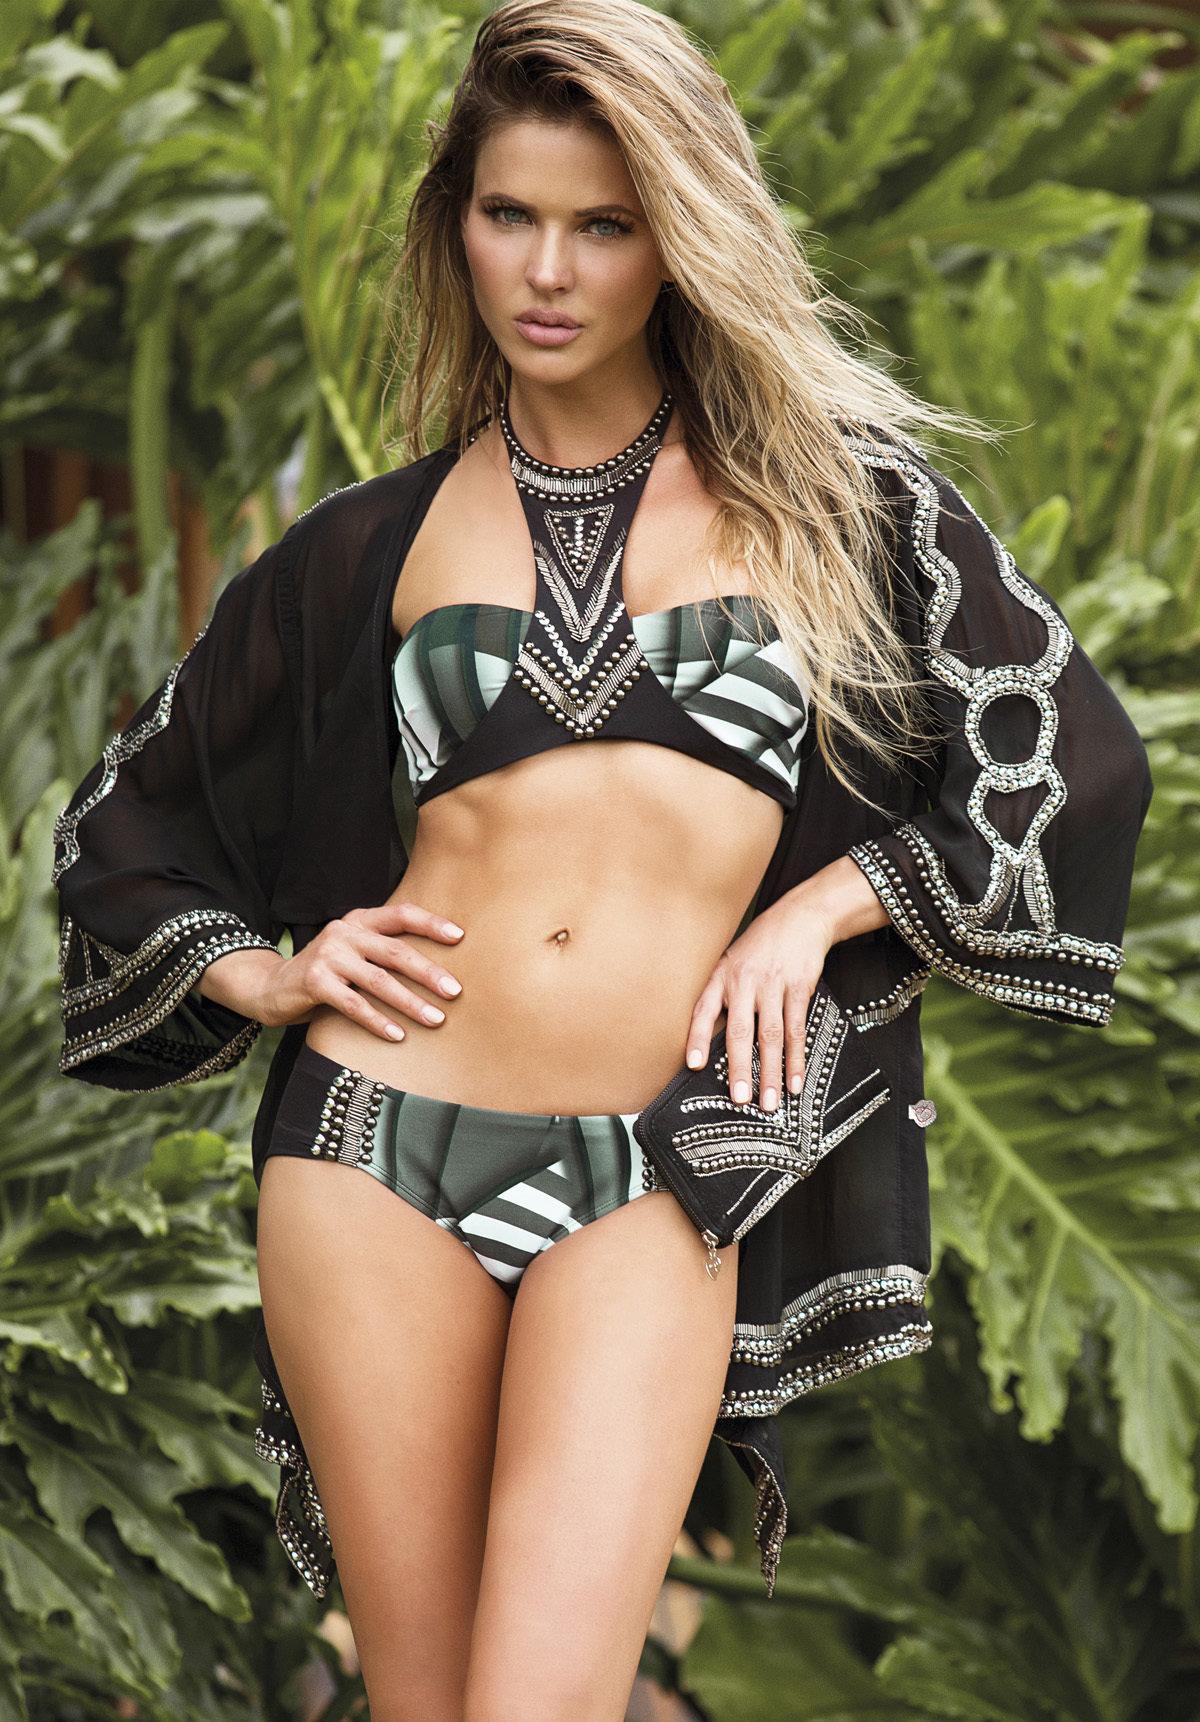 Paradizia Swimwear: Black Onyx Cutout Bikini Top SOLD OUT